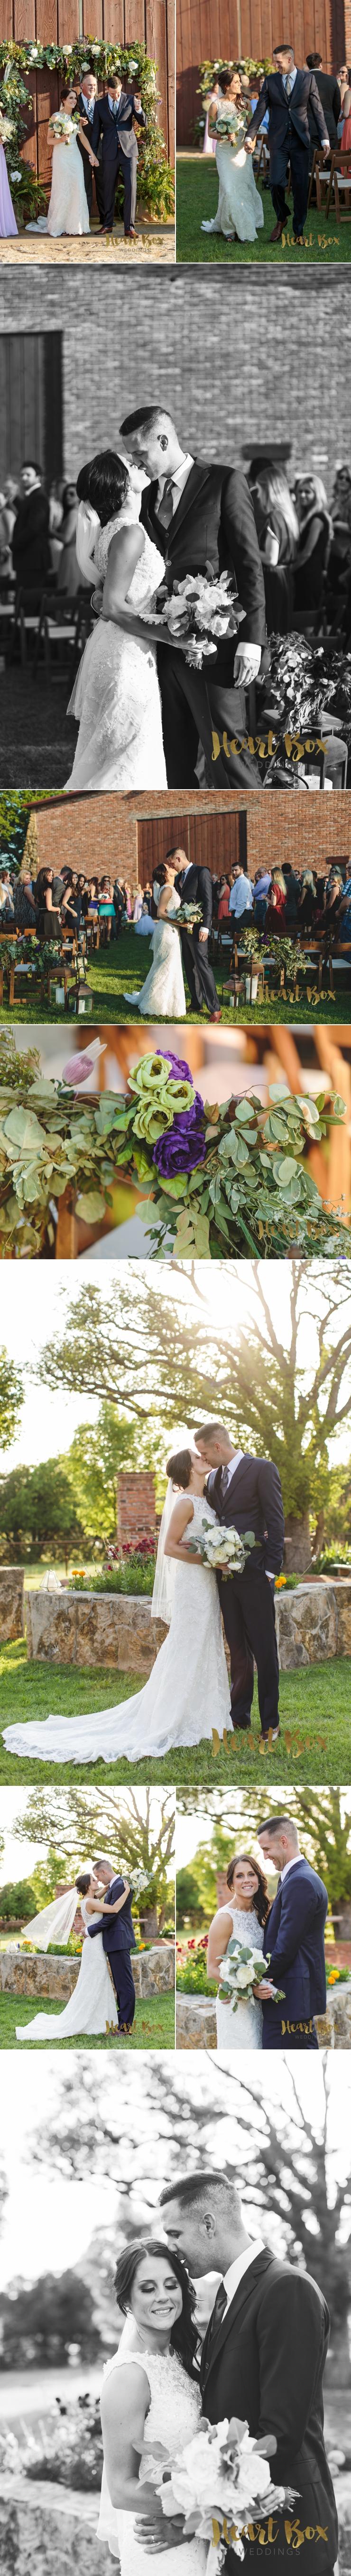 Thomas Wedding Blog Collages 6.jpg